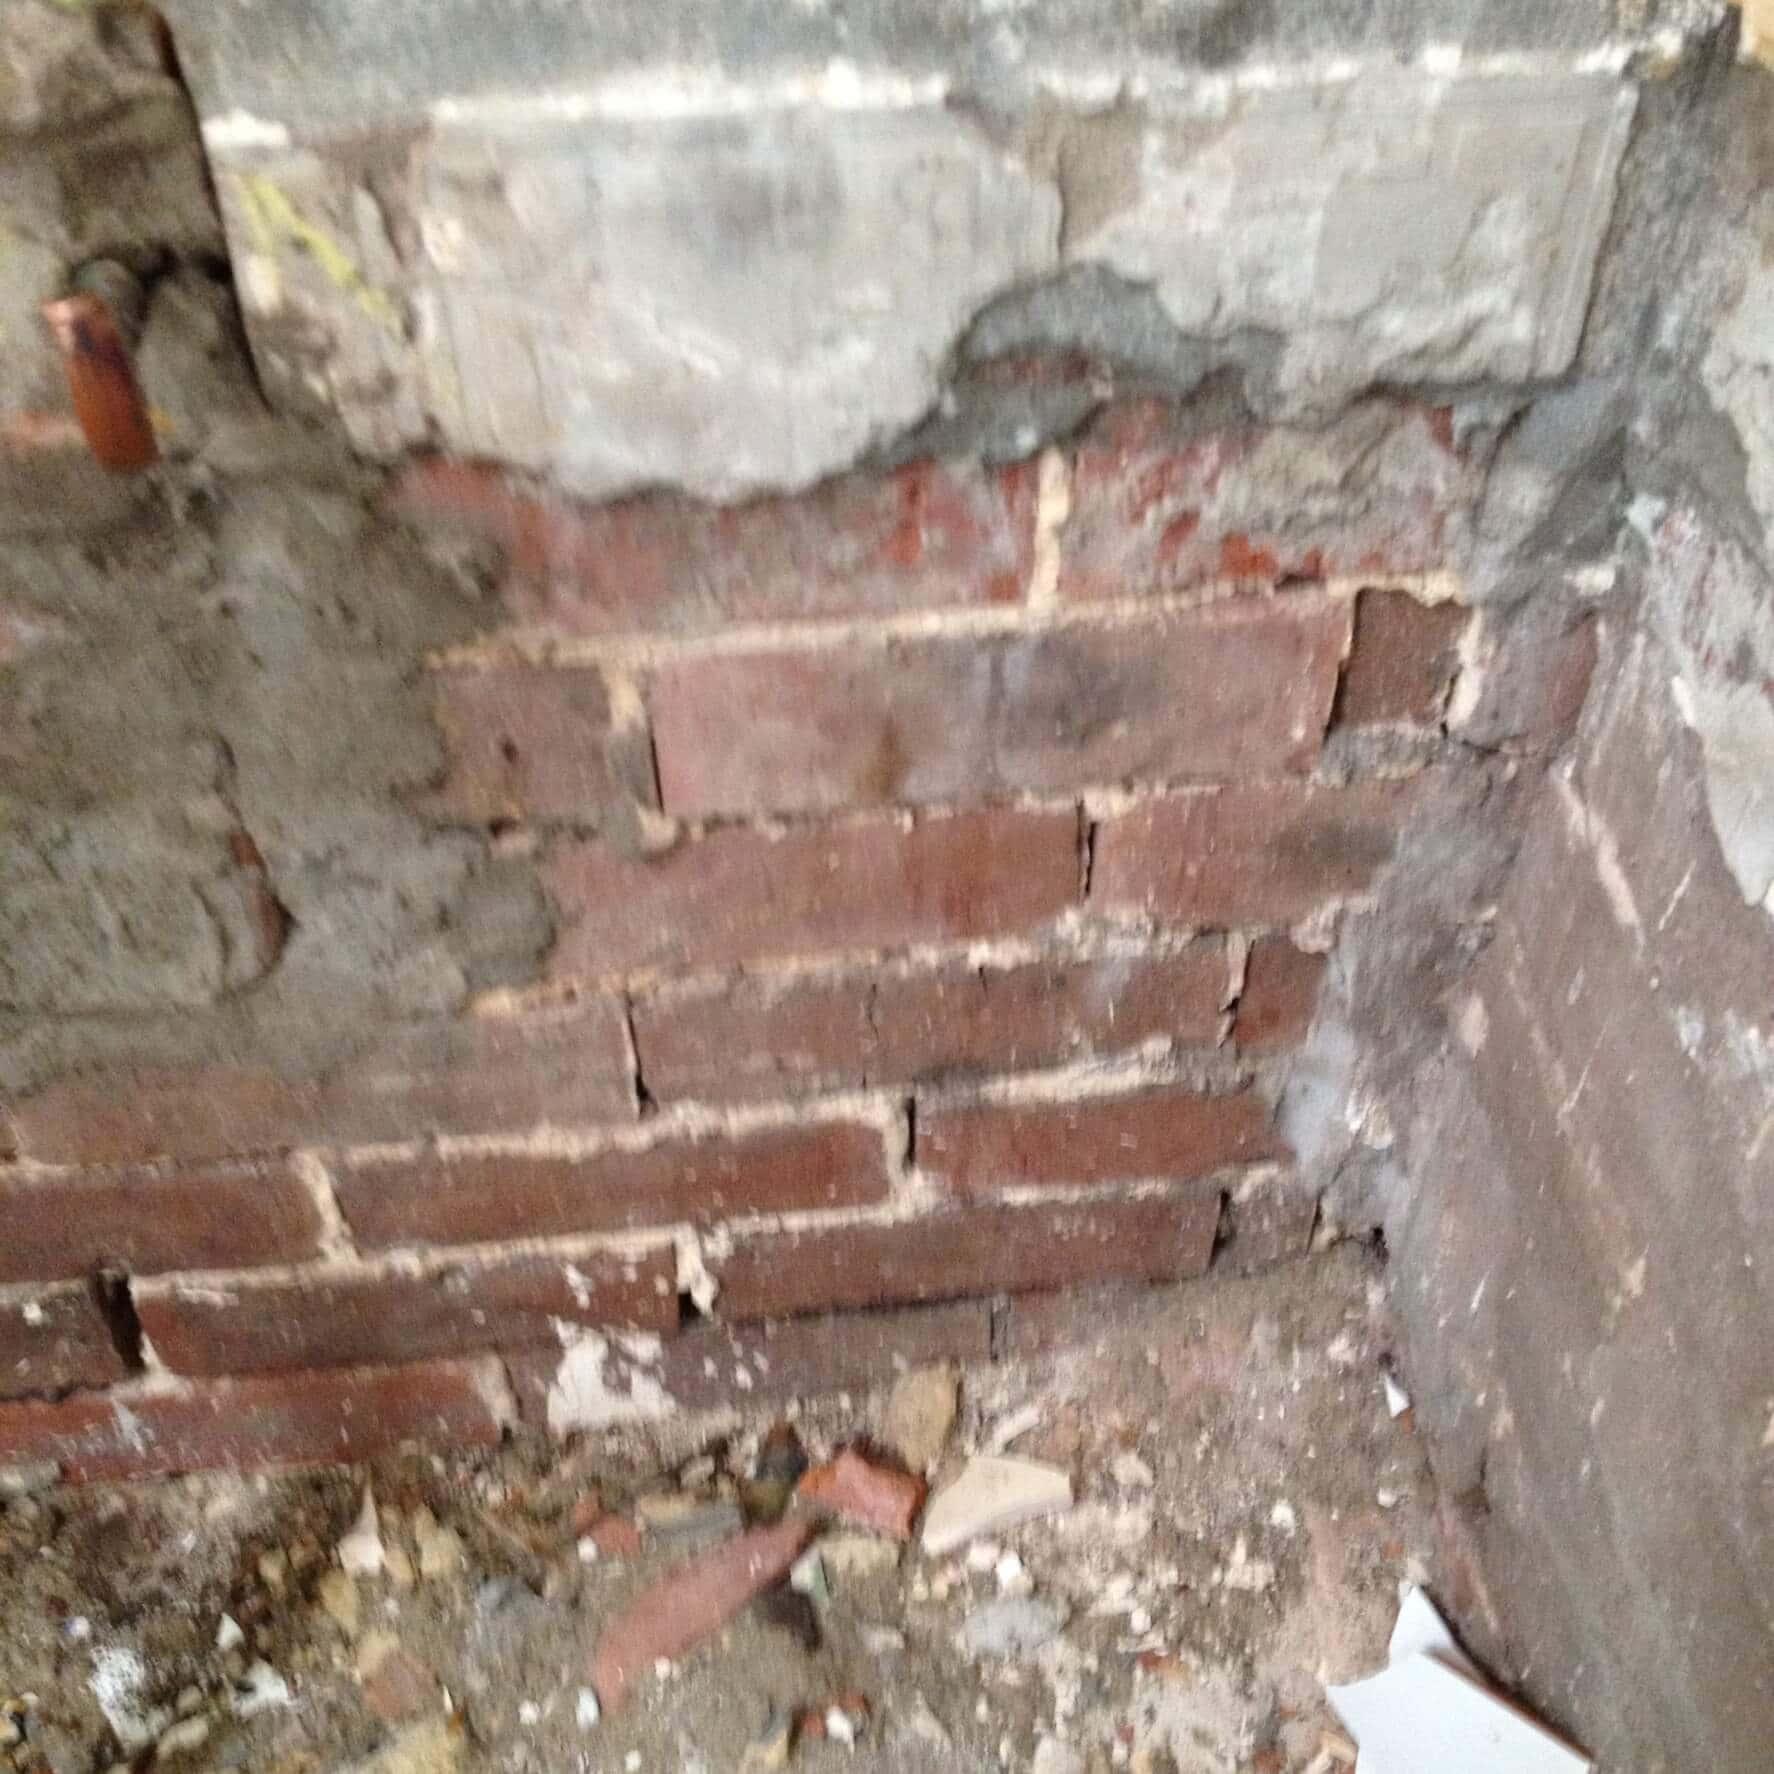 Everyday Plumbers Residential Vanity Basin Repairs - Basin Repair in Progress Wall Patching 0394